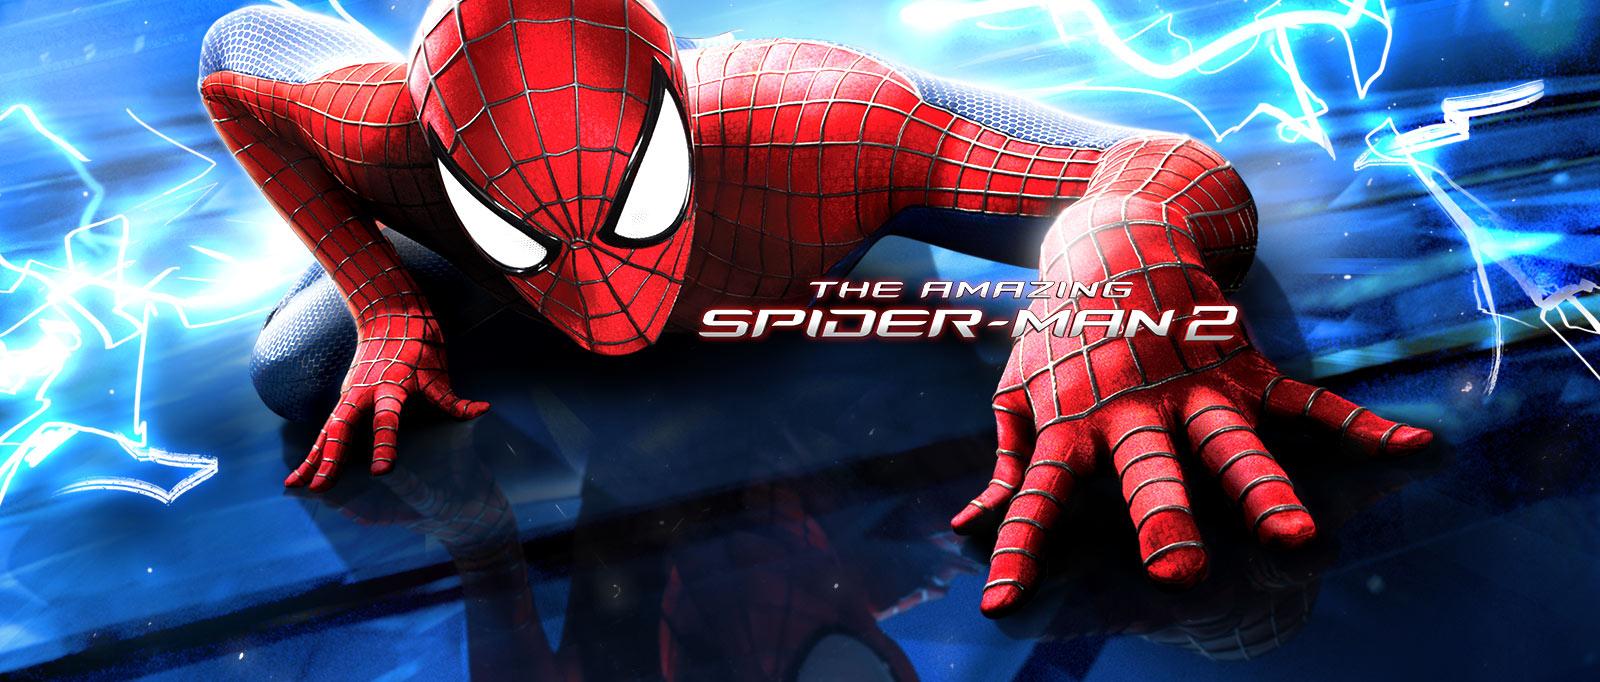 download game spiderman 2 java jar